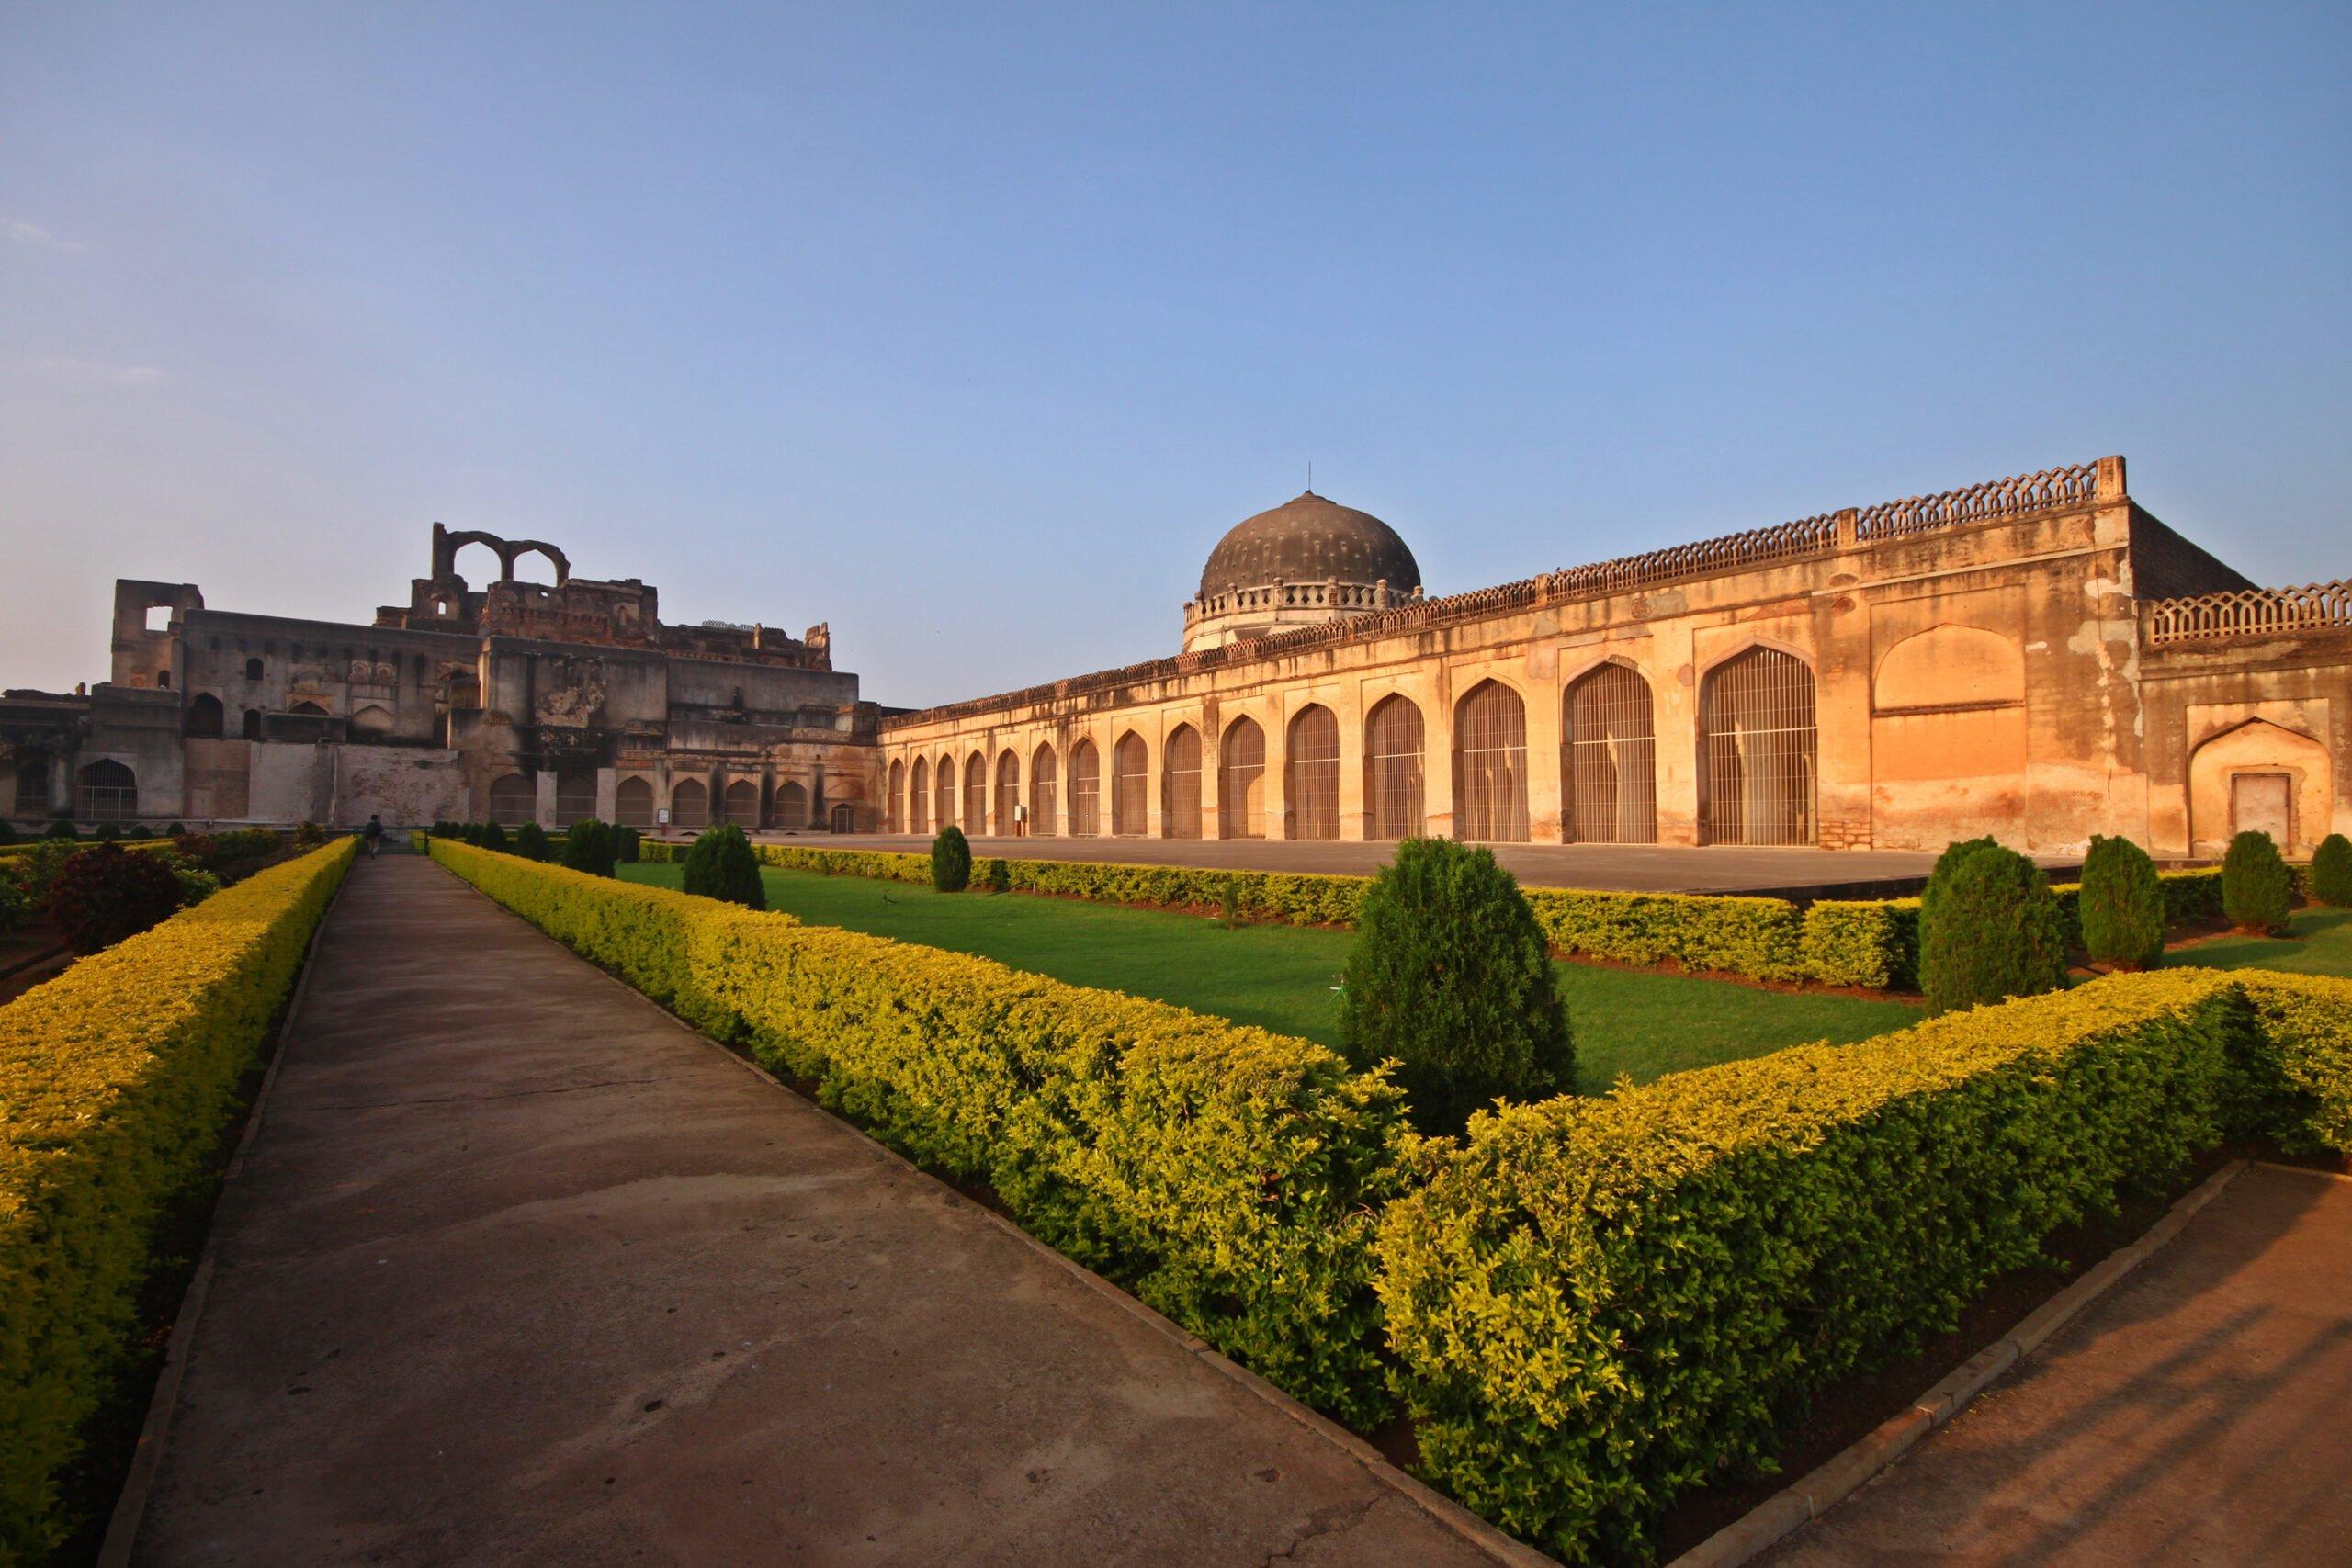 Travel To 11th Century When Bidar Was A Flourishing Kingdom In Our 2 Day Legacy Of Sultans & Wildlife Tour In Bidar